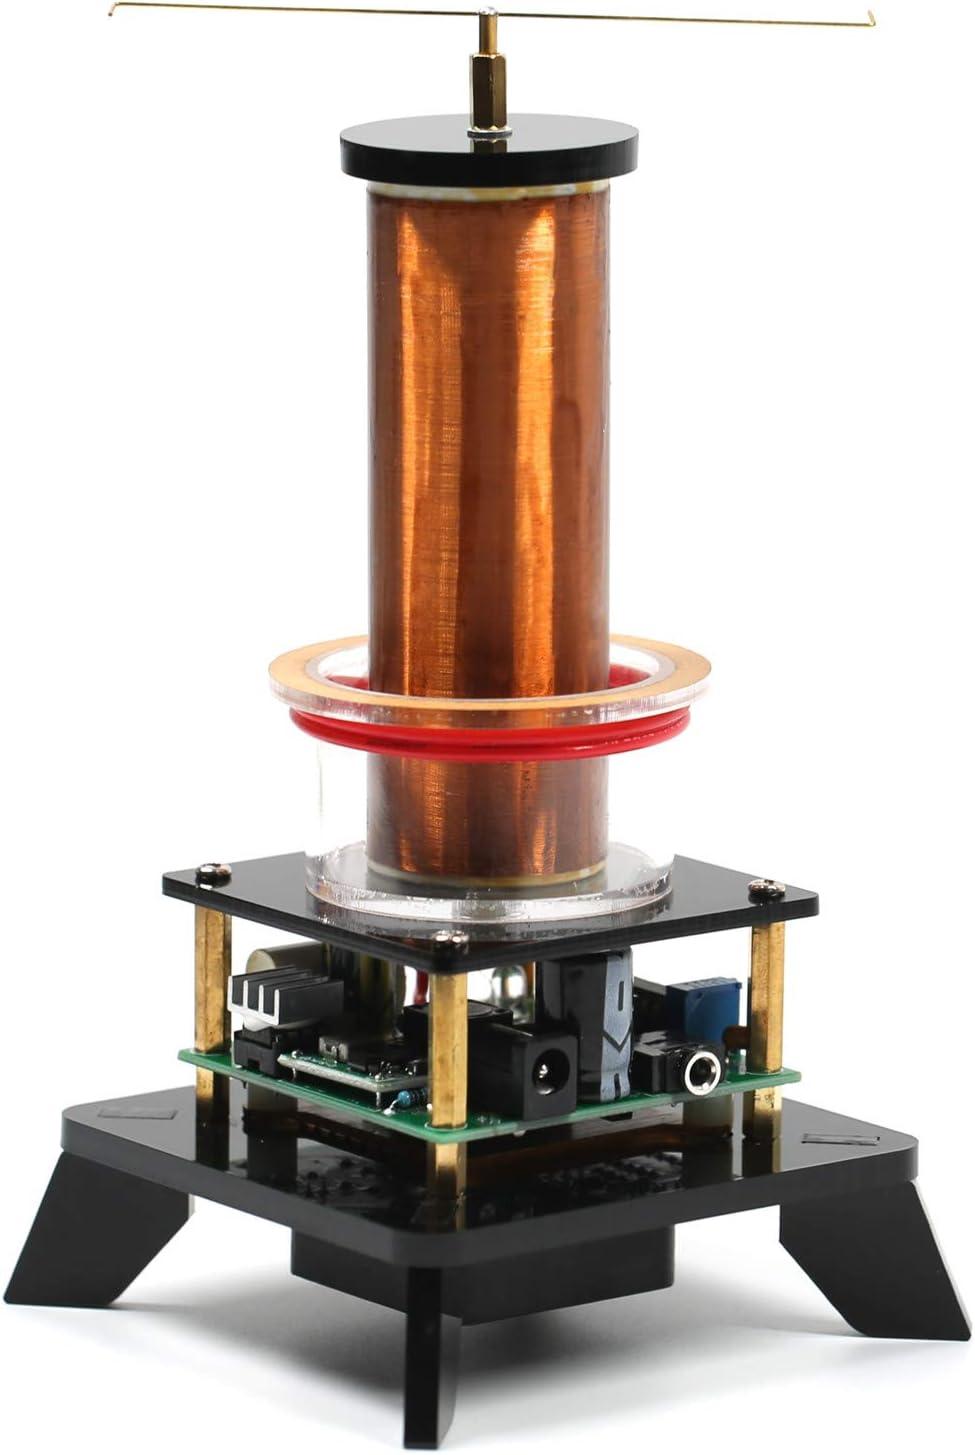 Toys & Games Learning & Education Joytech Music Tesla Coil Arc ...